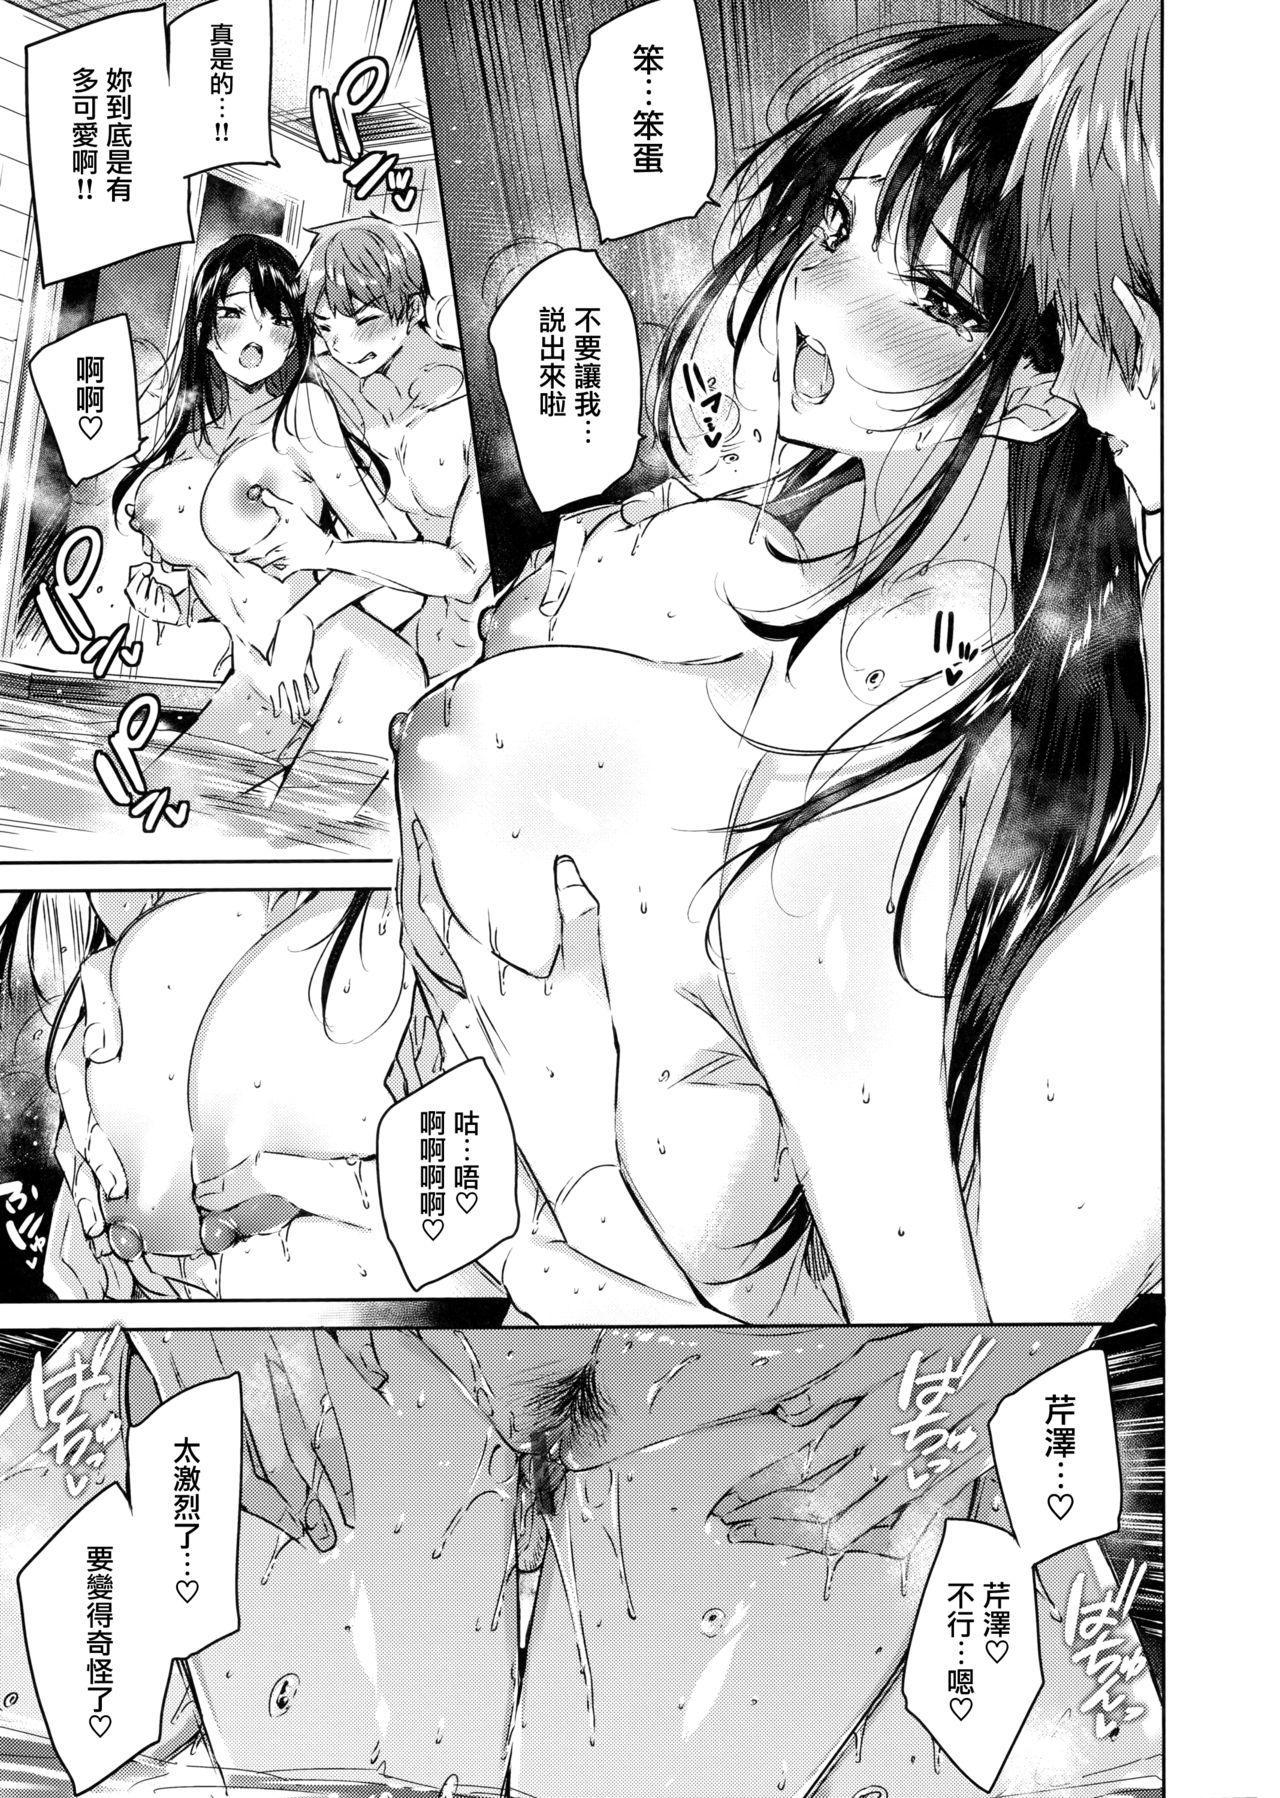 [Kakao] Nakadashi Strike! - Winning strike! Ch. 1-2  [Chinese] [兔司姬漢化組] 42